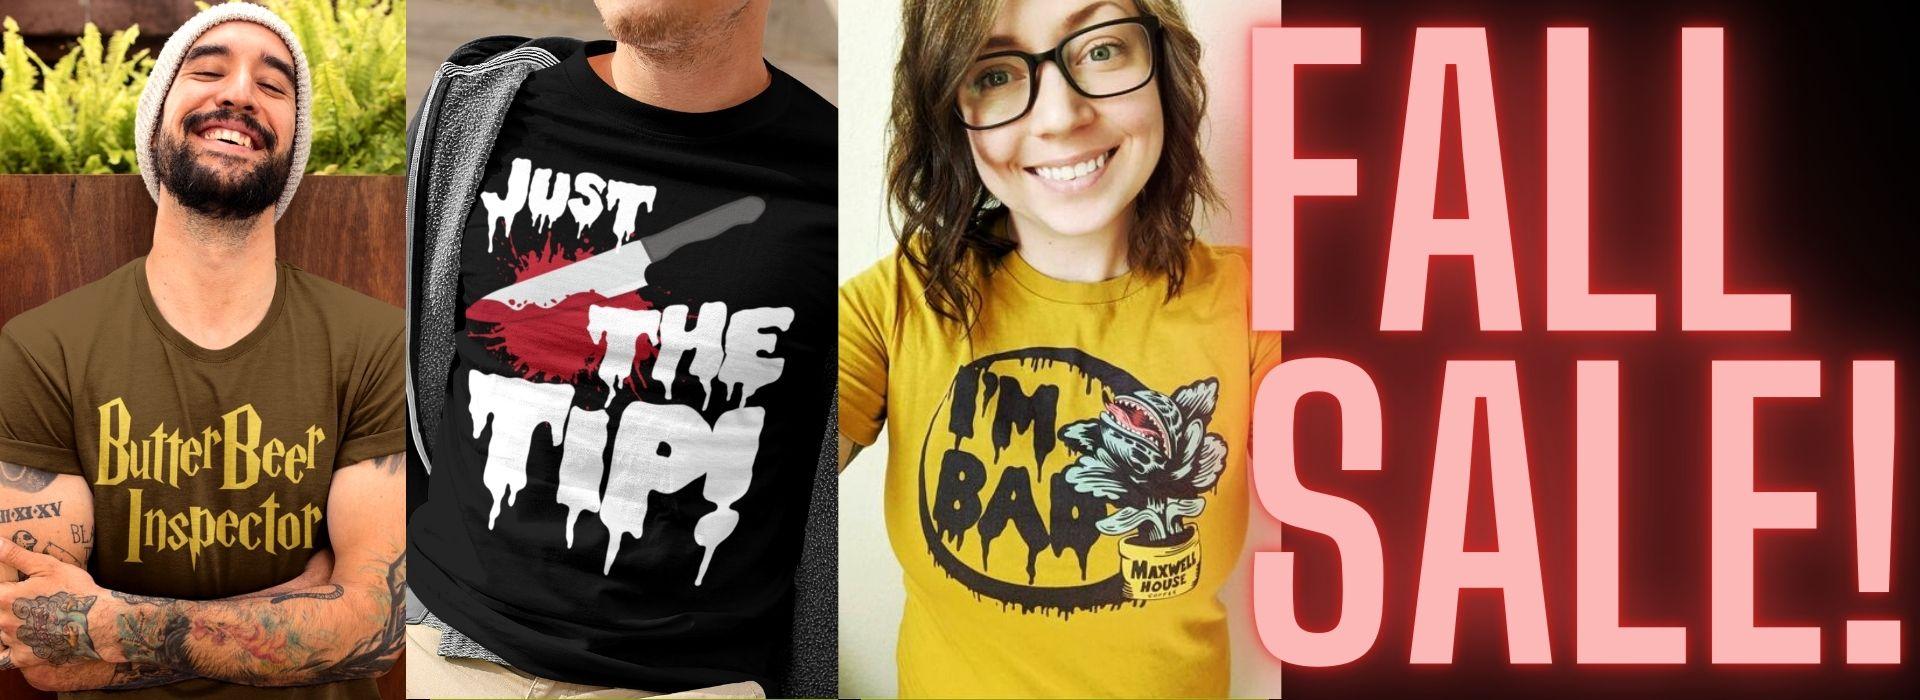 Culture Sub T-Shirts Halloween Fall Sale Movies TV Music